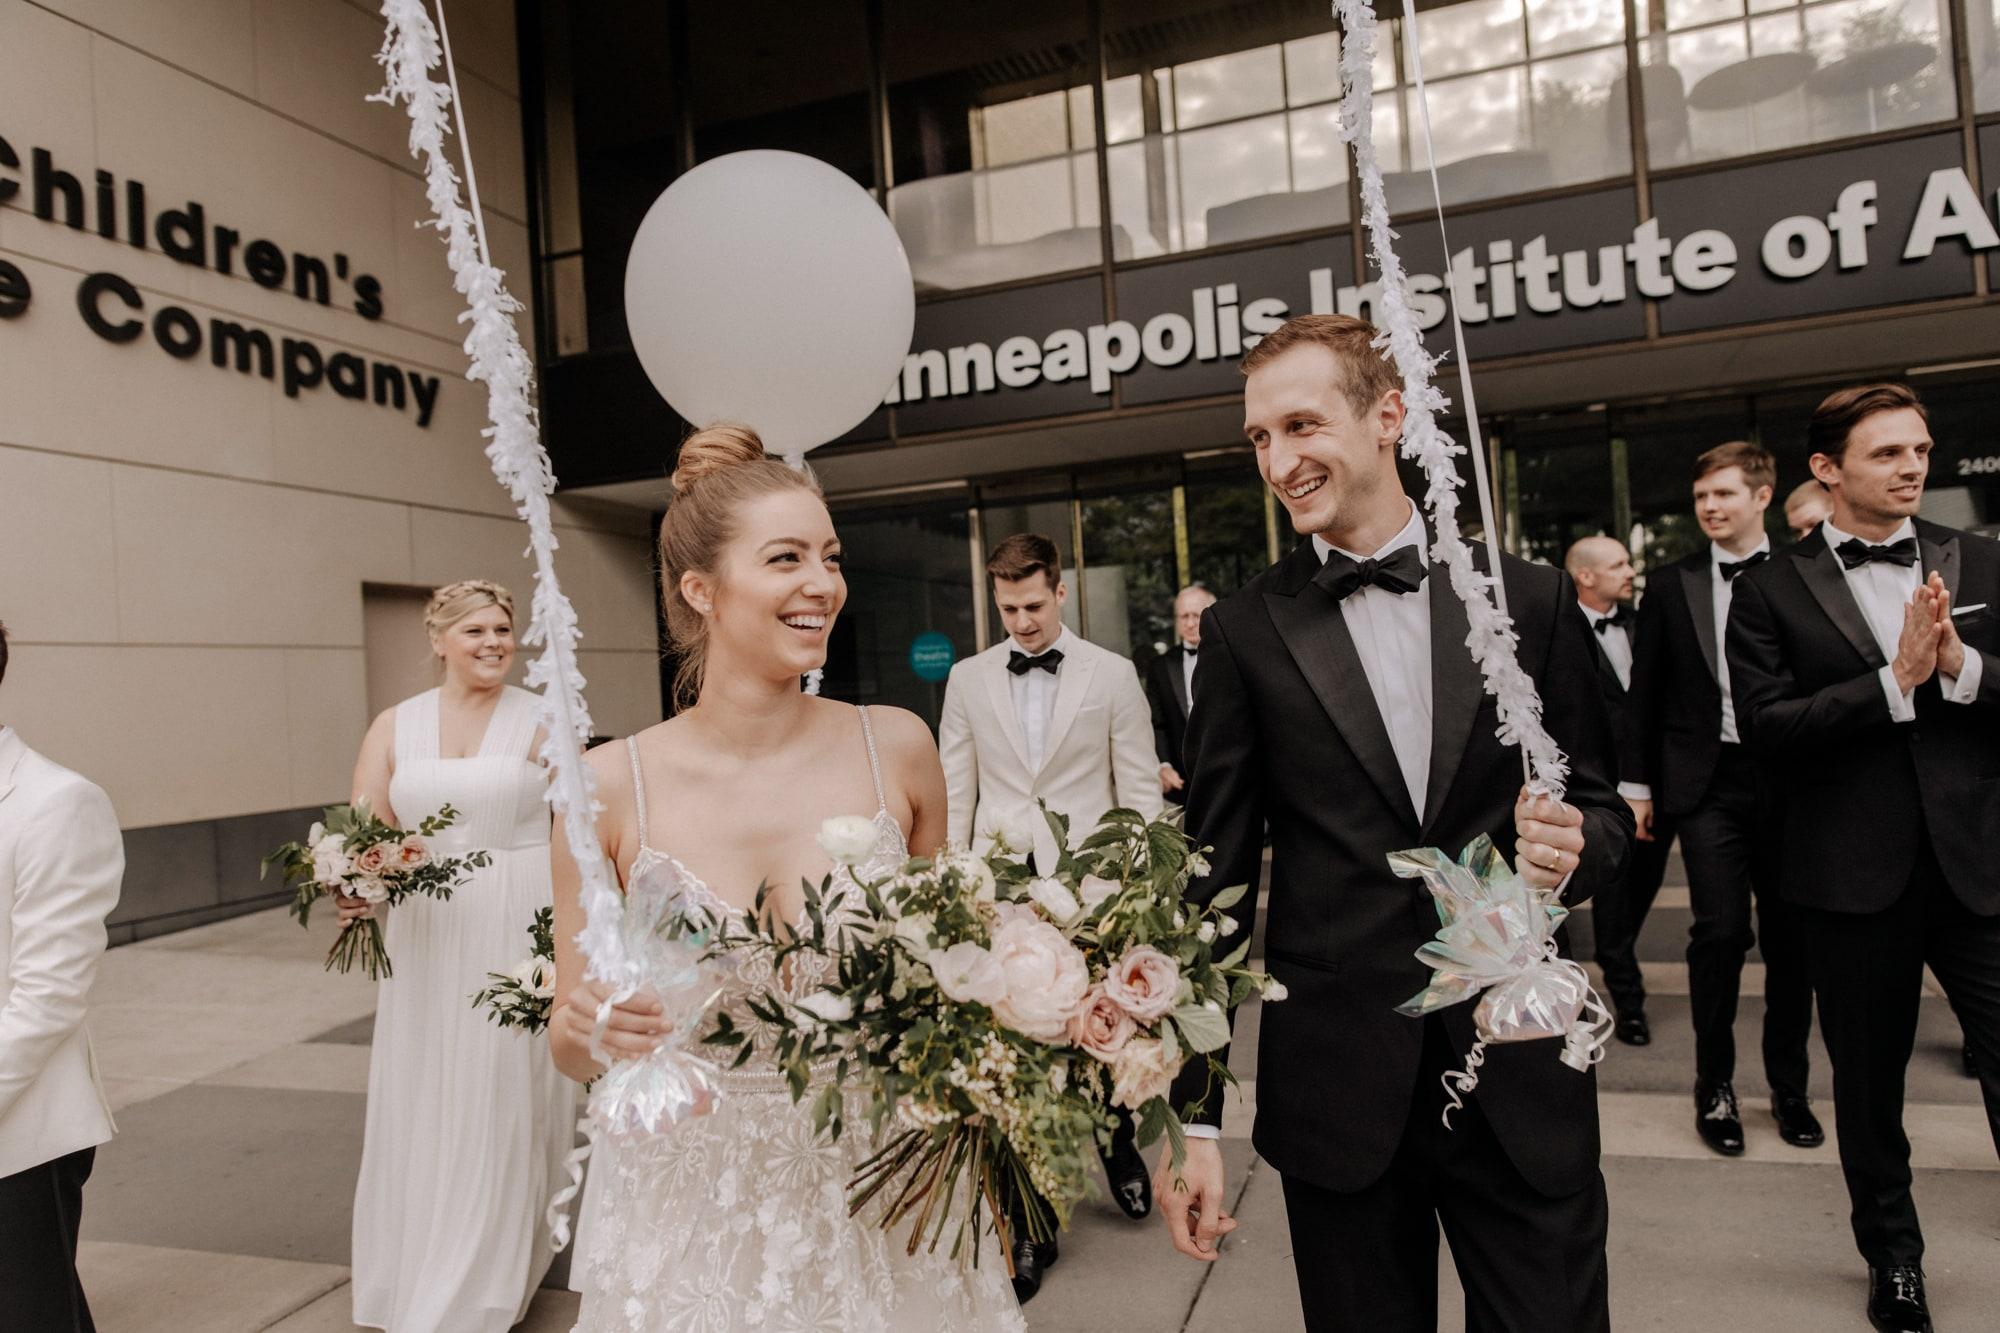 MIA-Minneapolis-Institute-Art-Summer-Wedding-_35.jpg